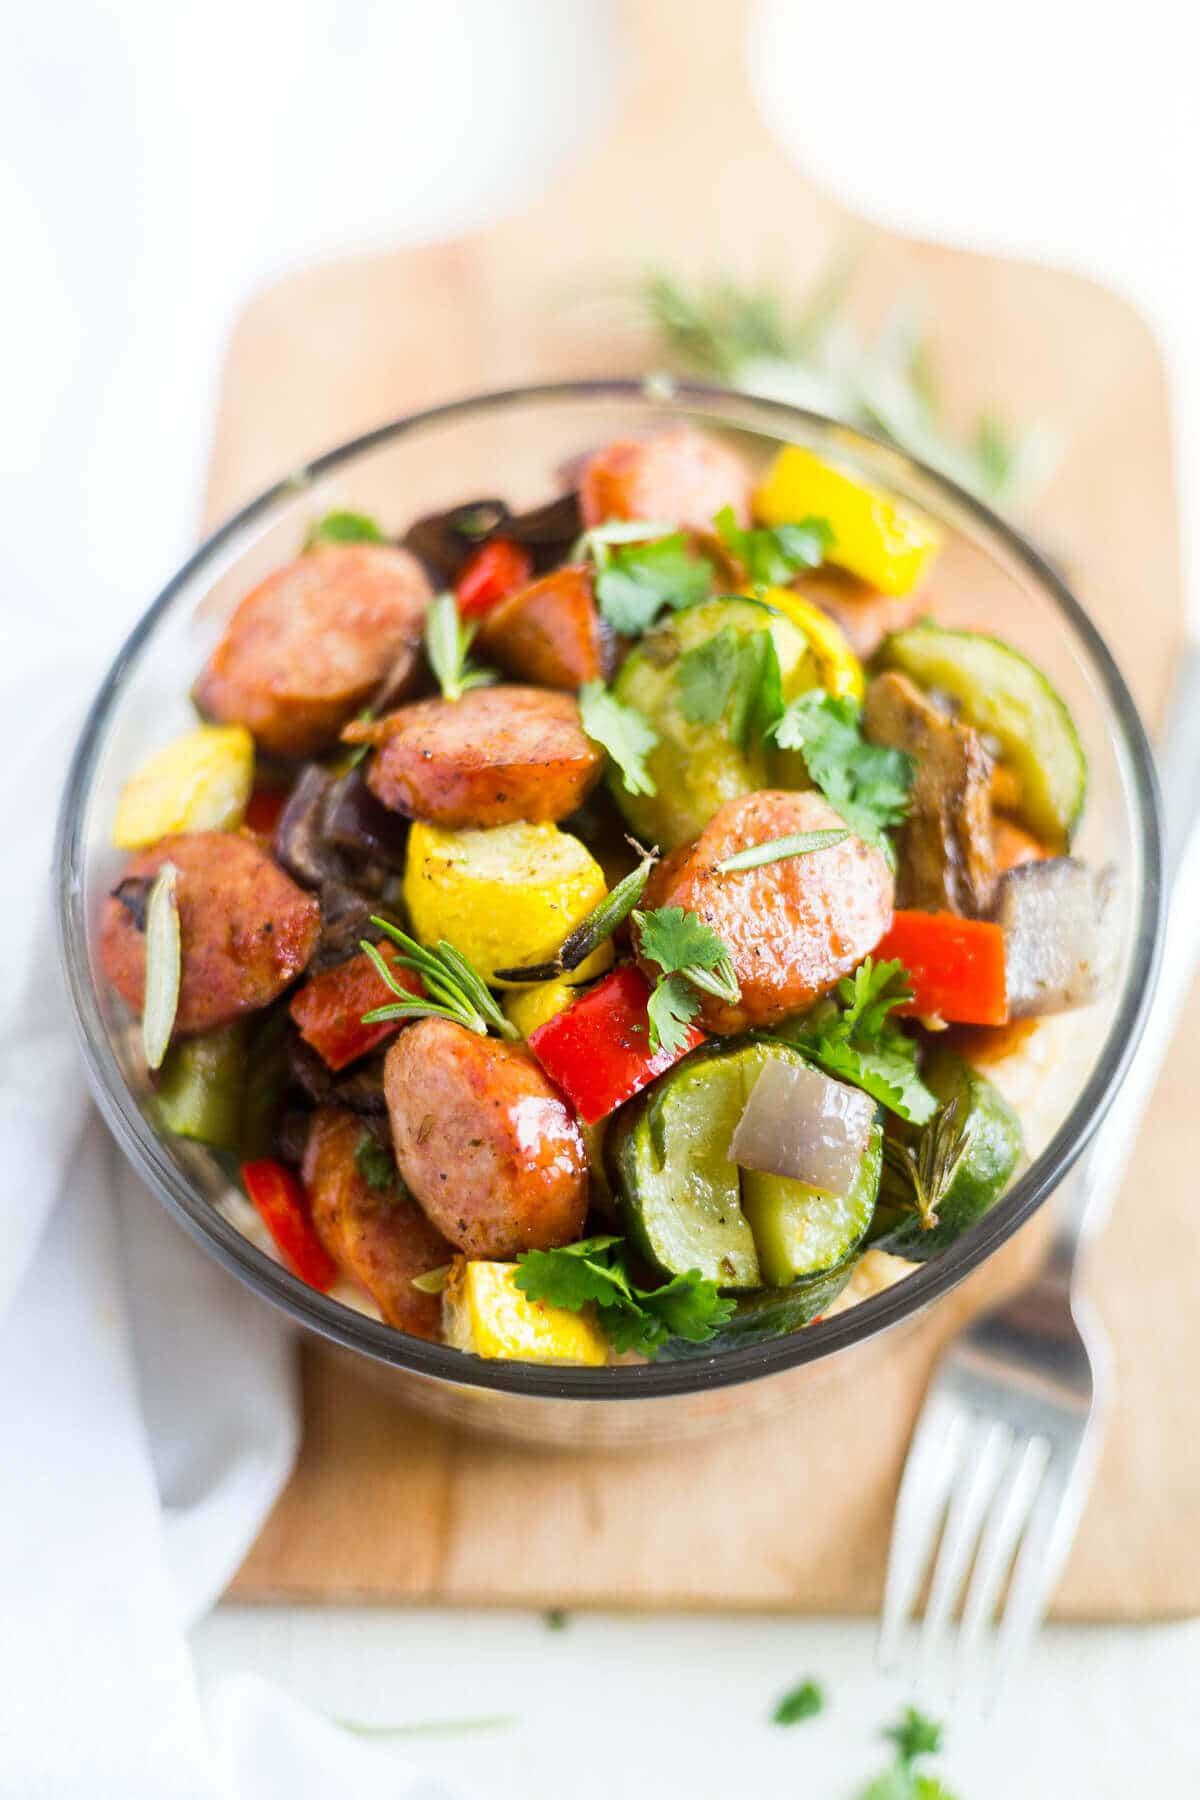 sausage and veggies bowl